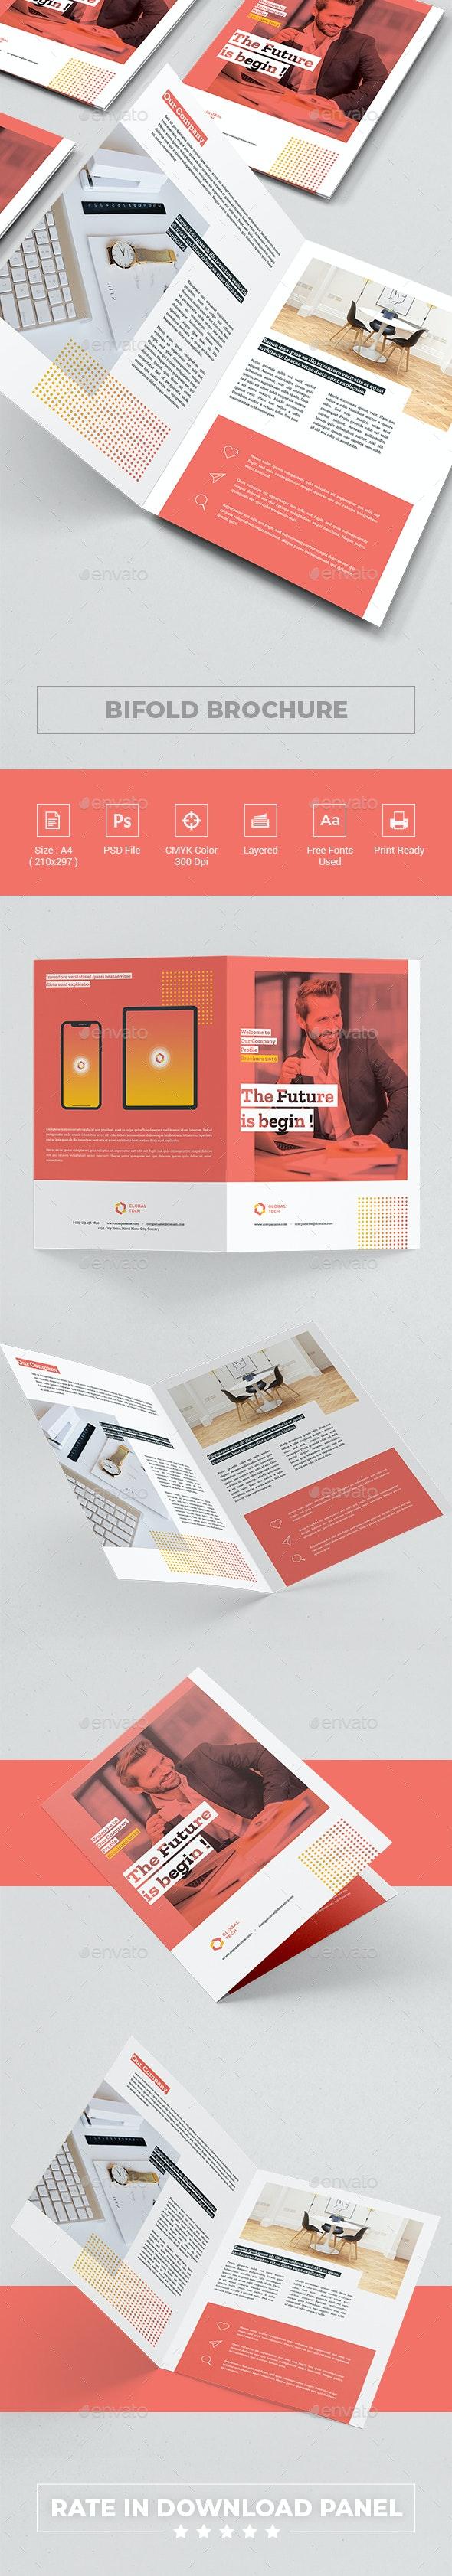 Company Bi-fold Brochure - Corporate Brochures